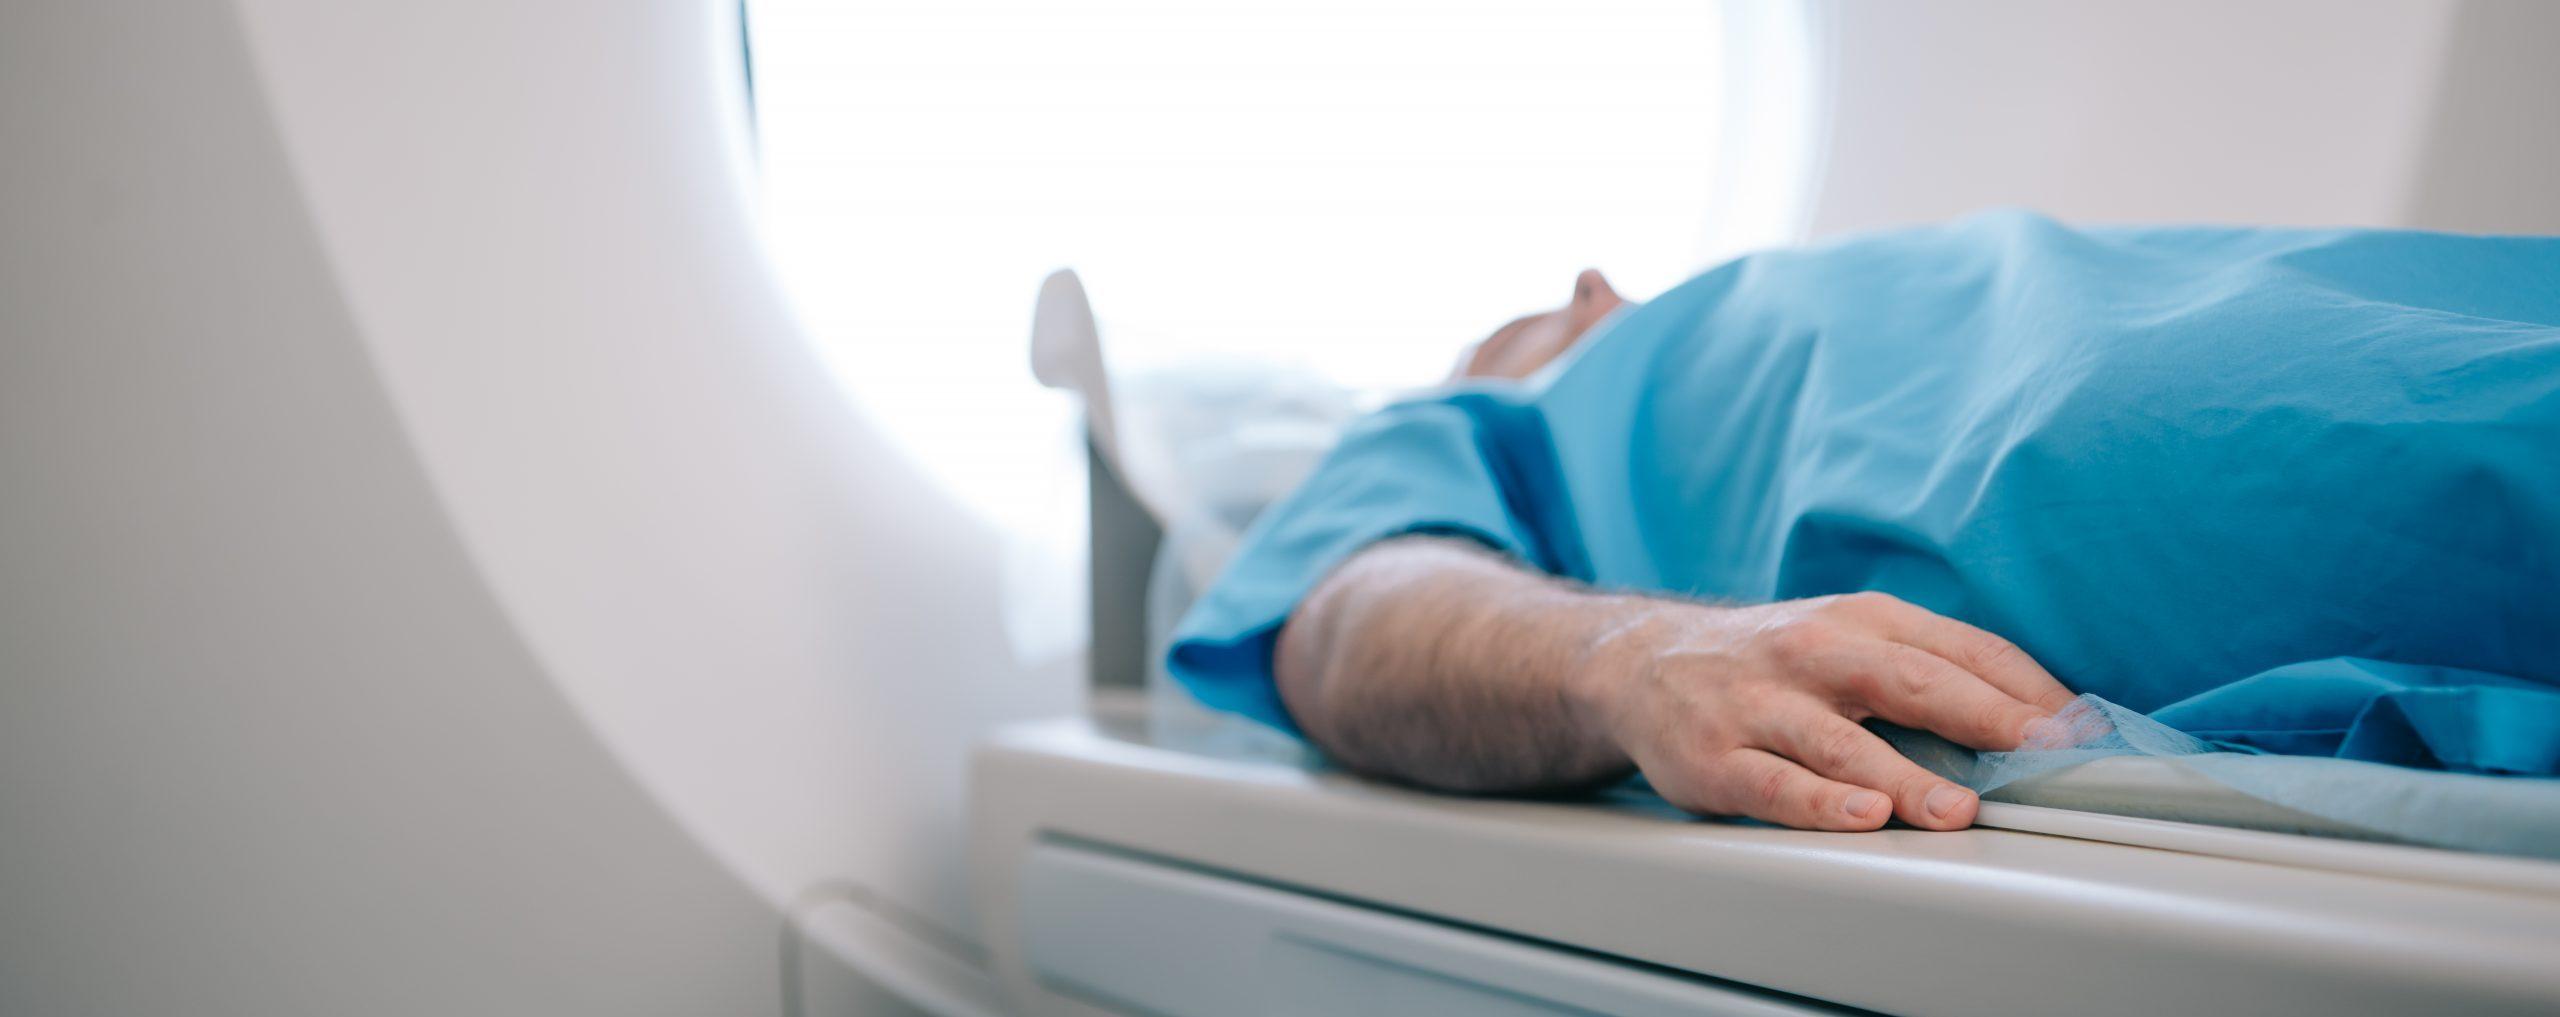 patient in ct scanner machine